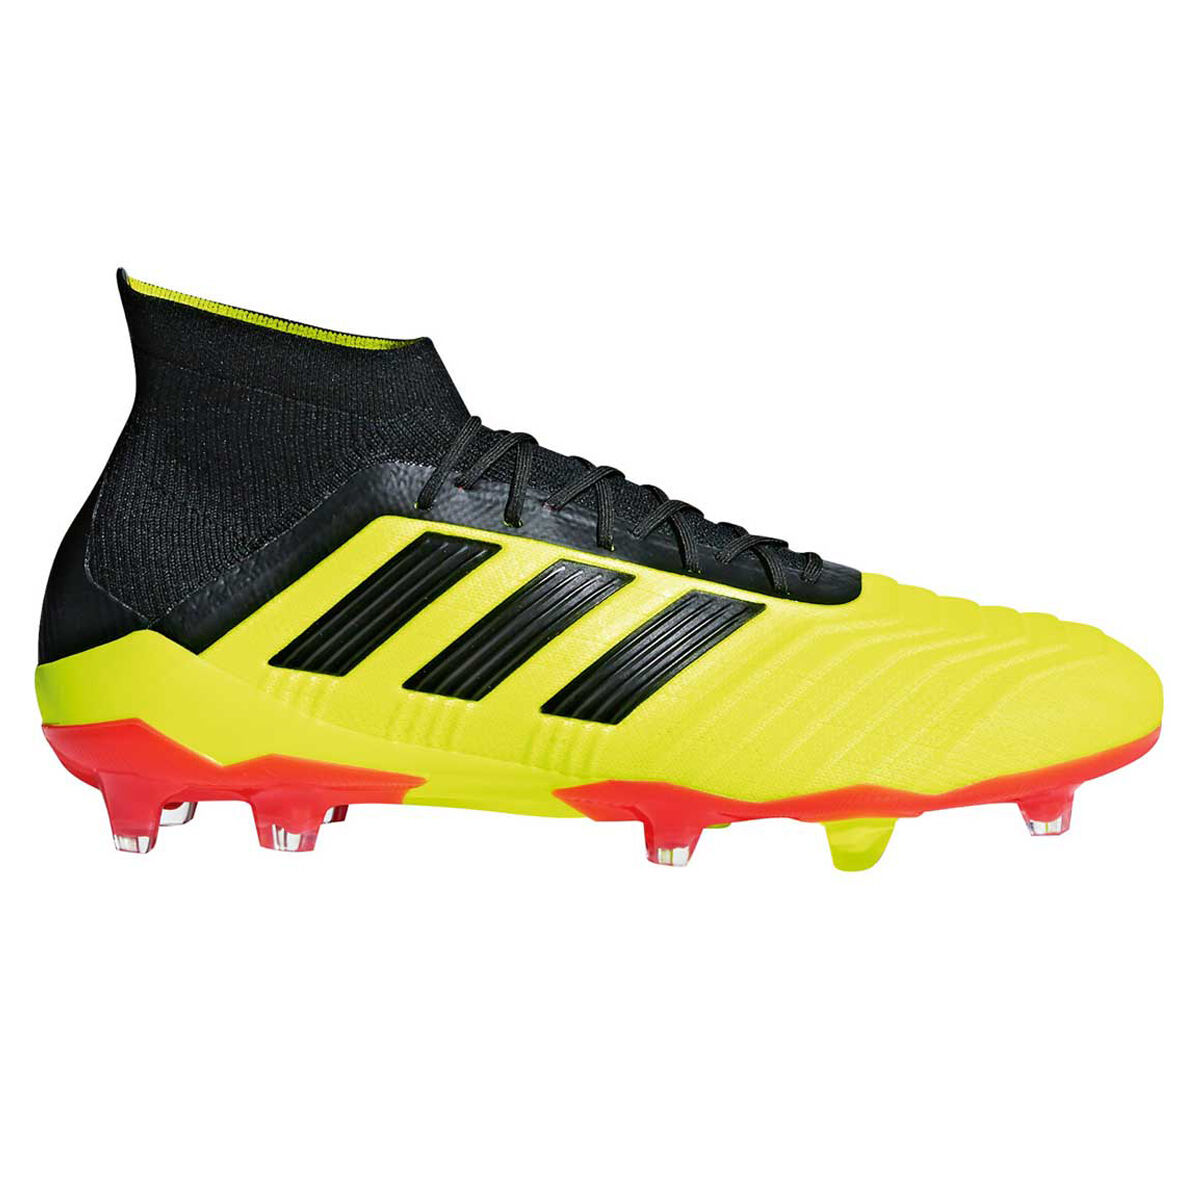 9b86824a8070 ... czech adidas predator 18.1 mens football boots lime black us 7 lime  black eb582 48675